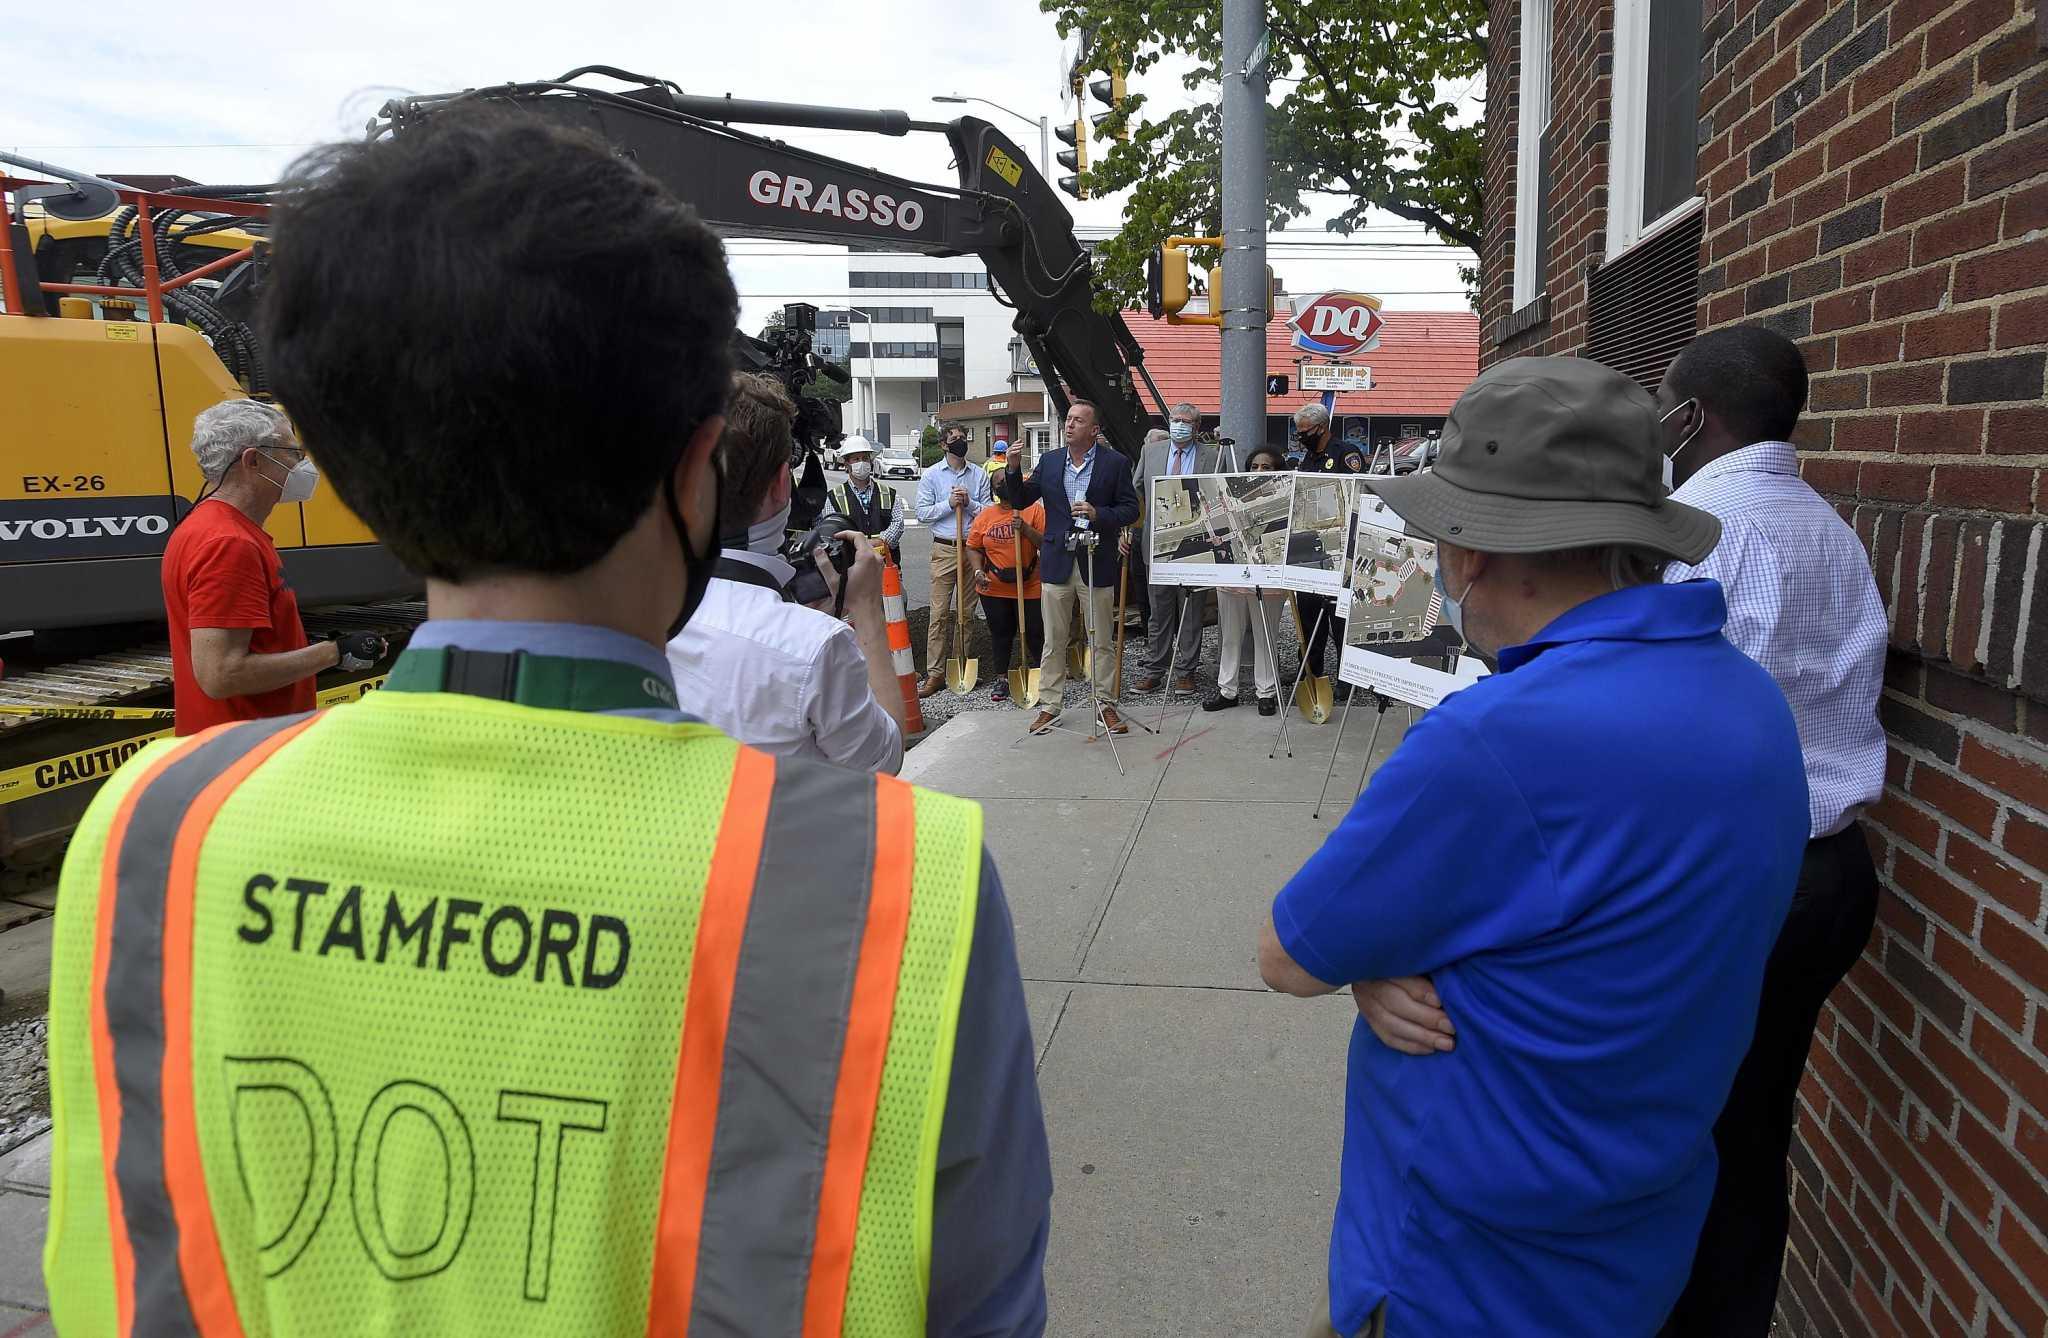 Stamford To Turn Downtown Block Into Pedestrian Promenade